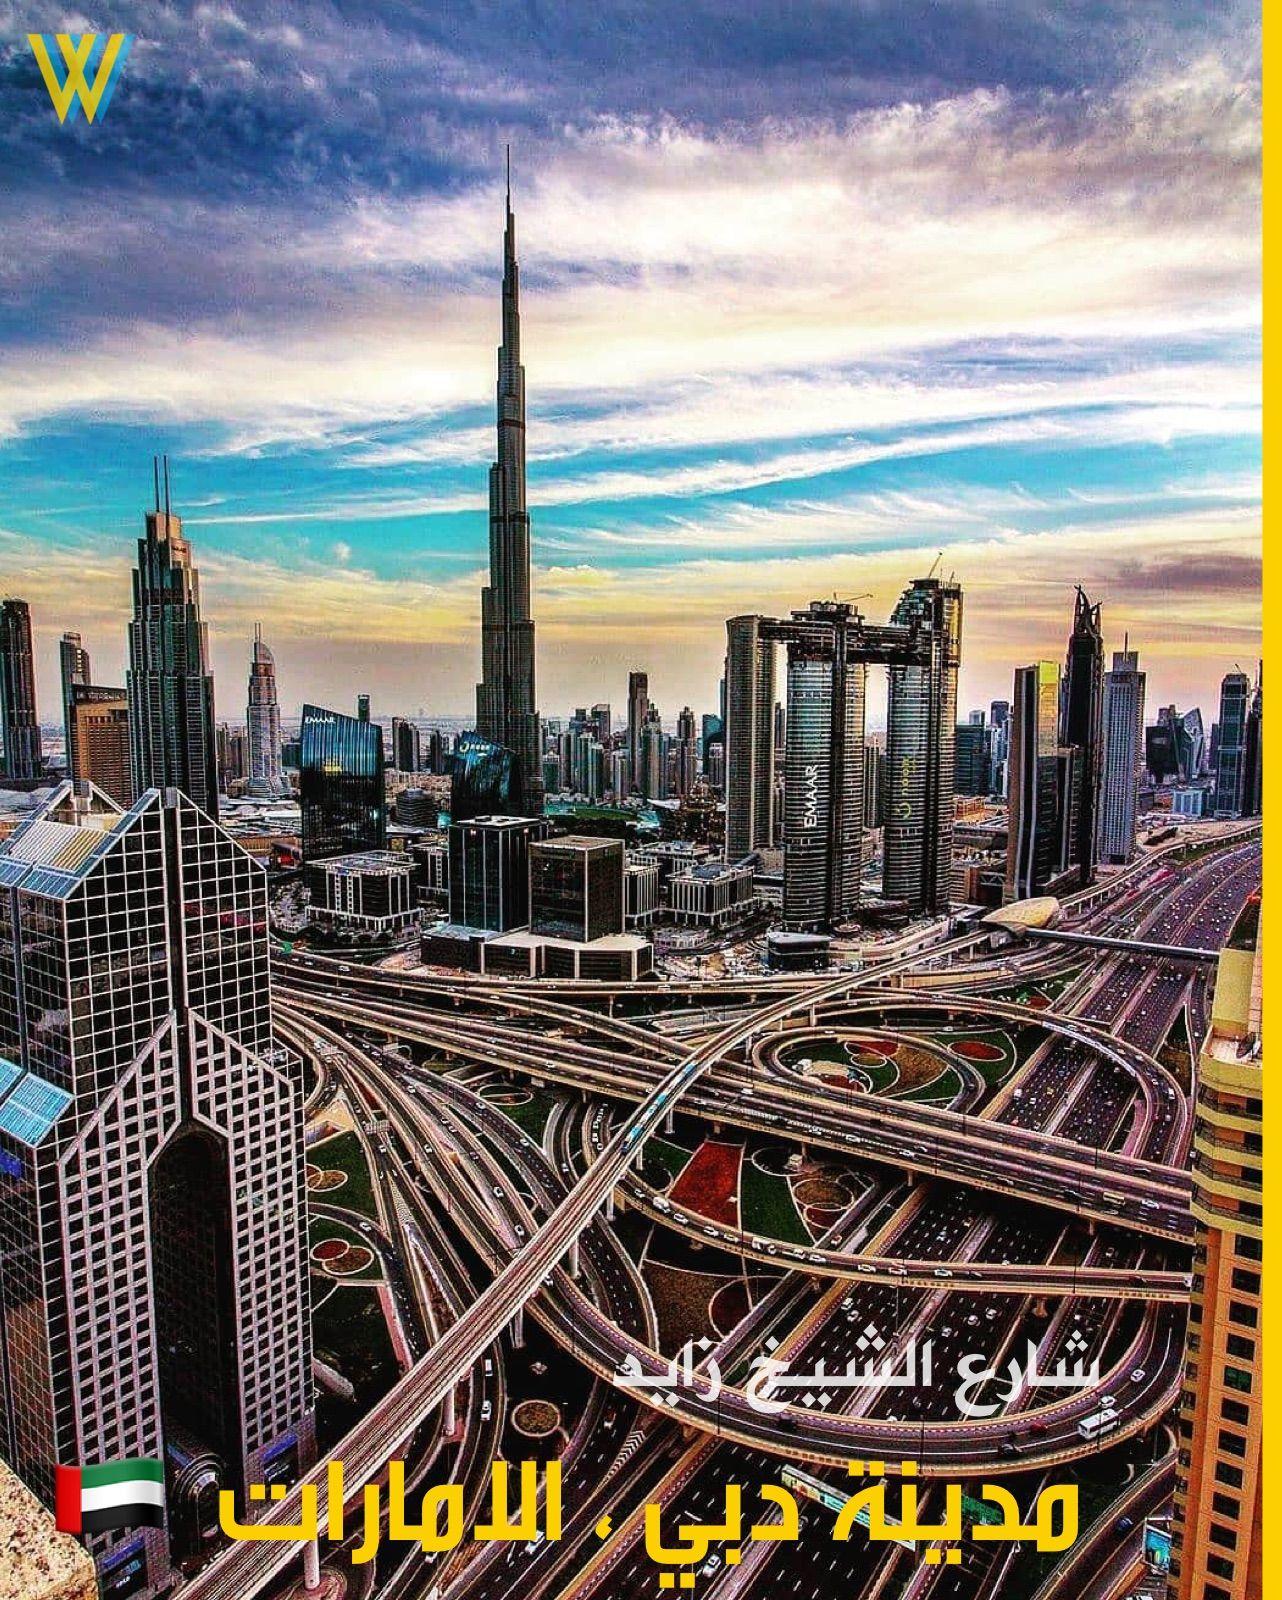 شارع الشيخ زايد دبي الامارات Places To Visit Dubai Travel Beautiful Places